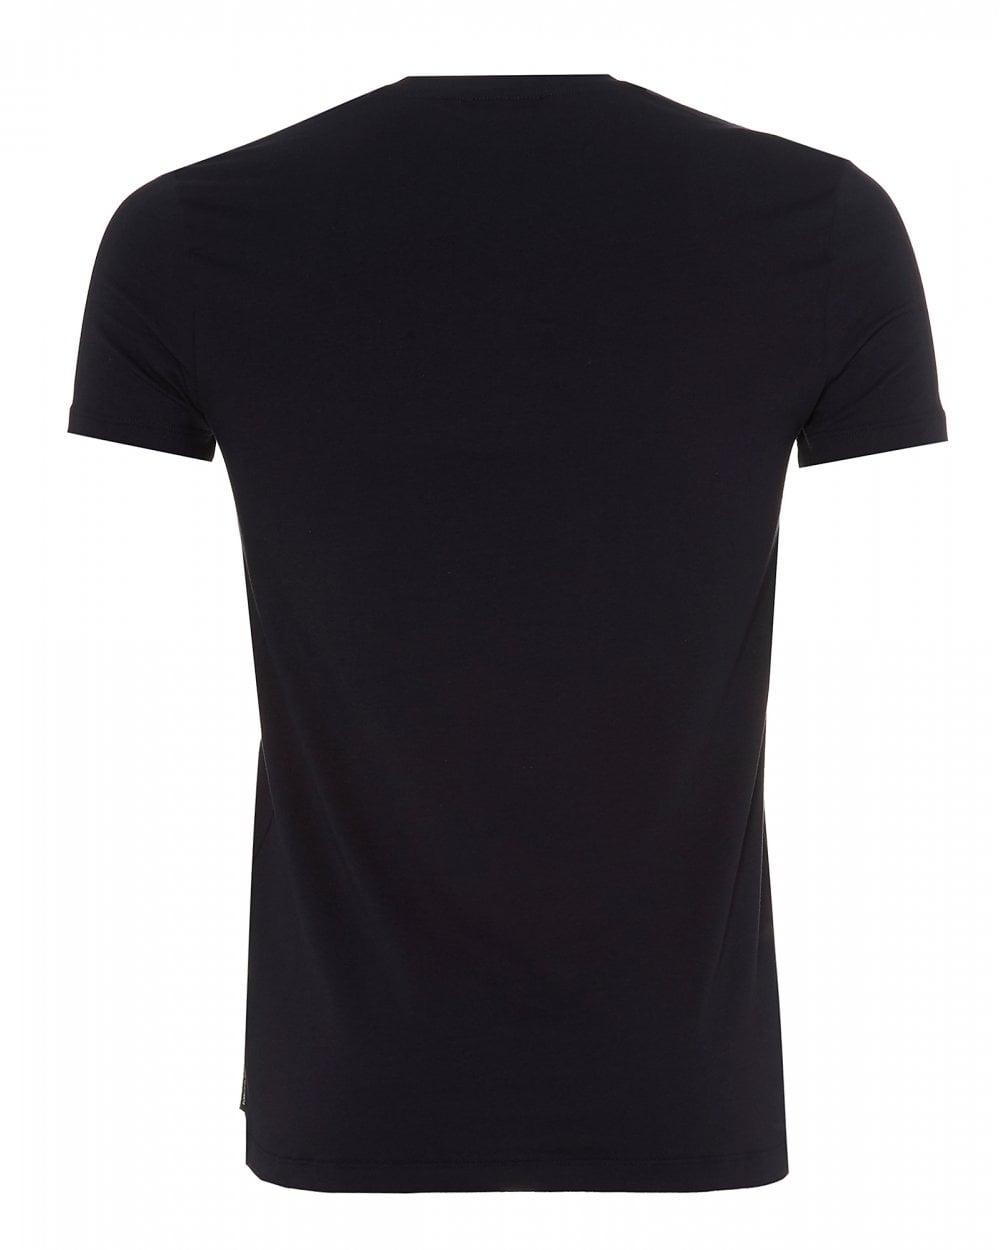 5a6c994c1c Mens Foiled Eagle Logo T-Shirt, Navy Blue Slim Fit Tee